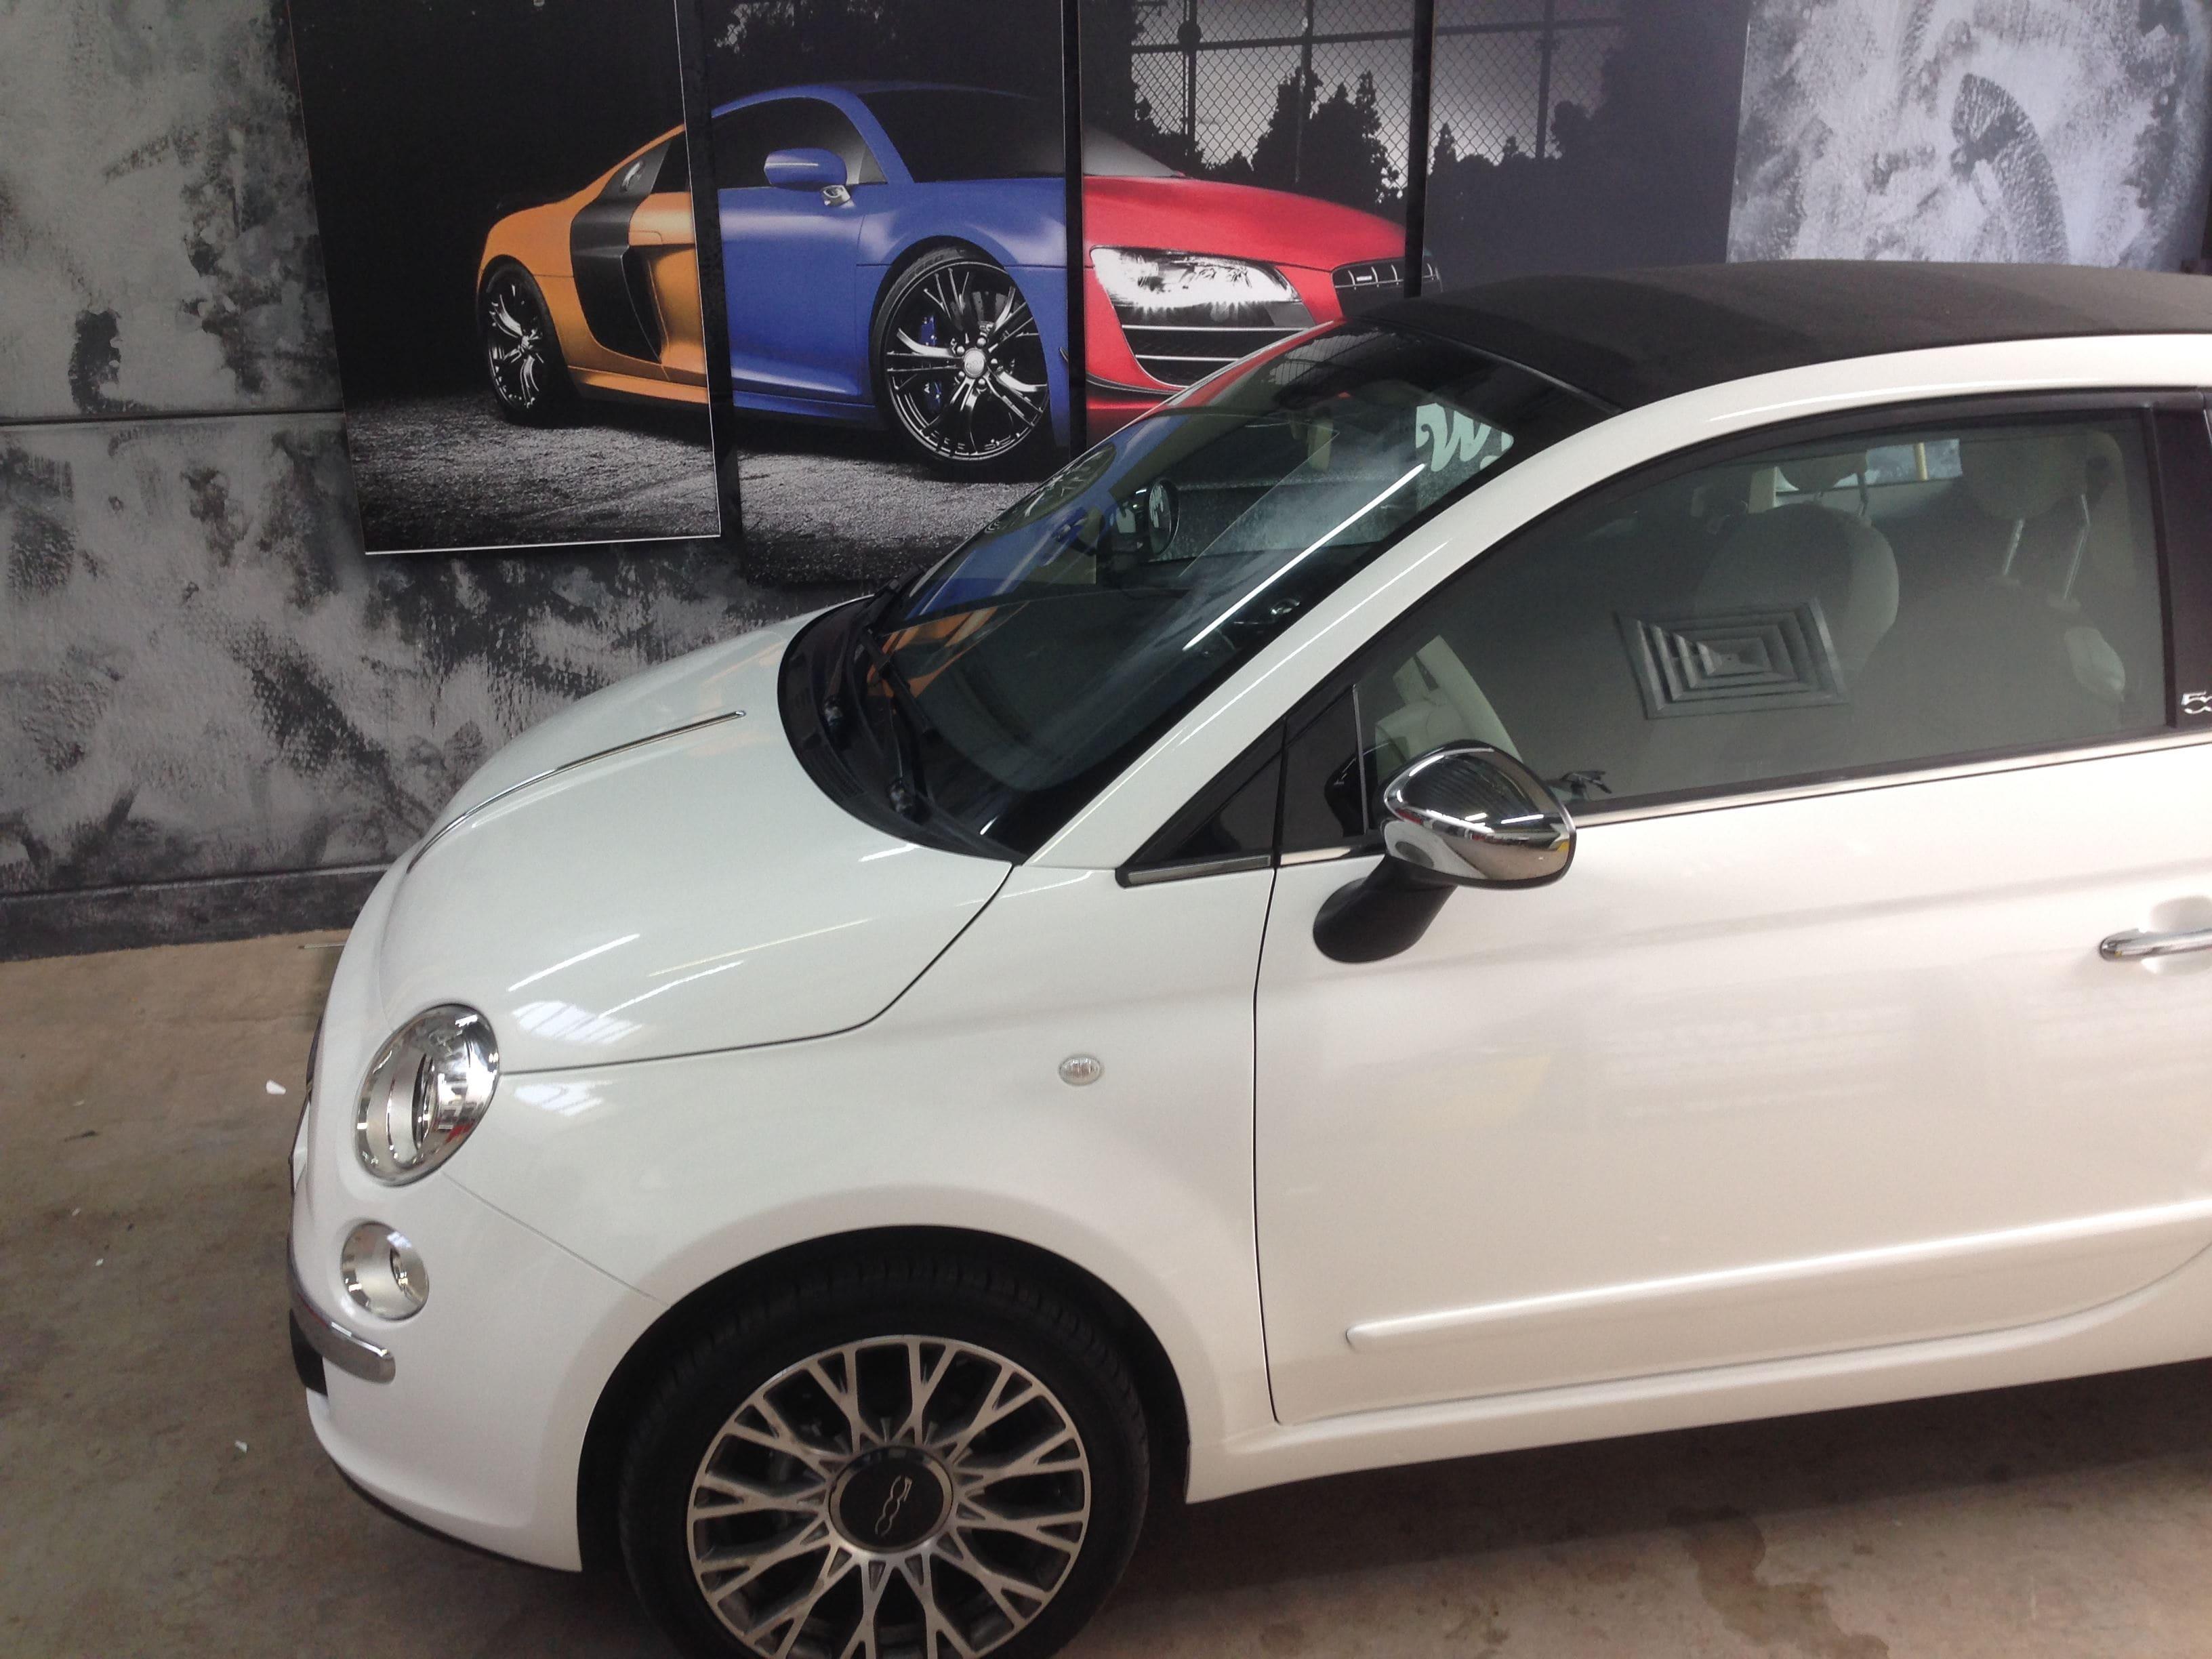 Fiat 500 met Glossy White Wrap, Carwrapping door Wrapmyride.nu Foto-nr:5726, ©2020